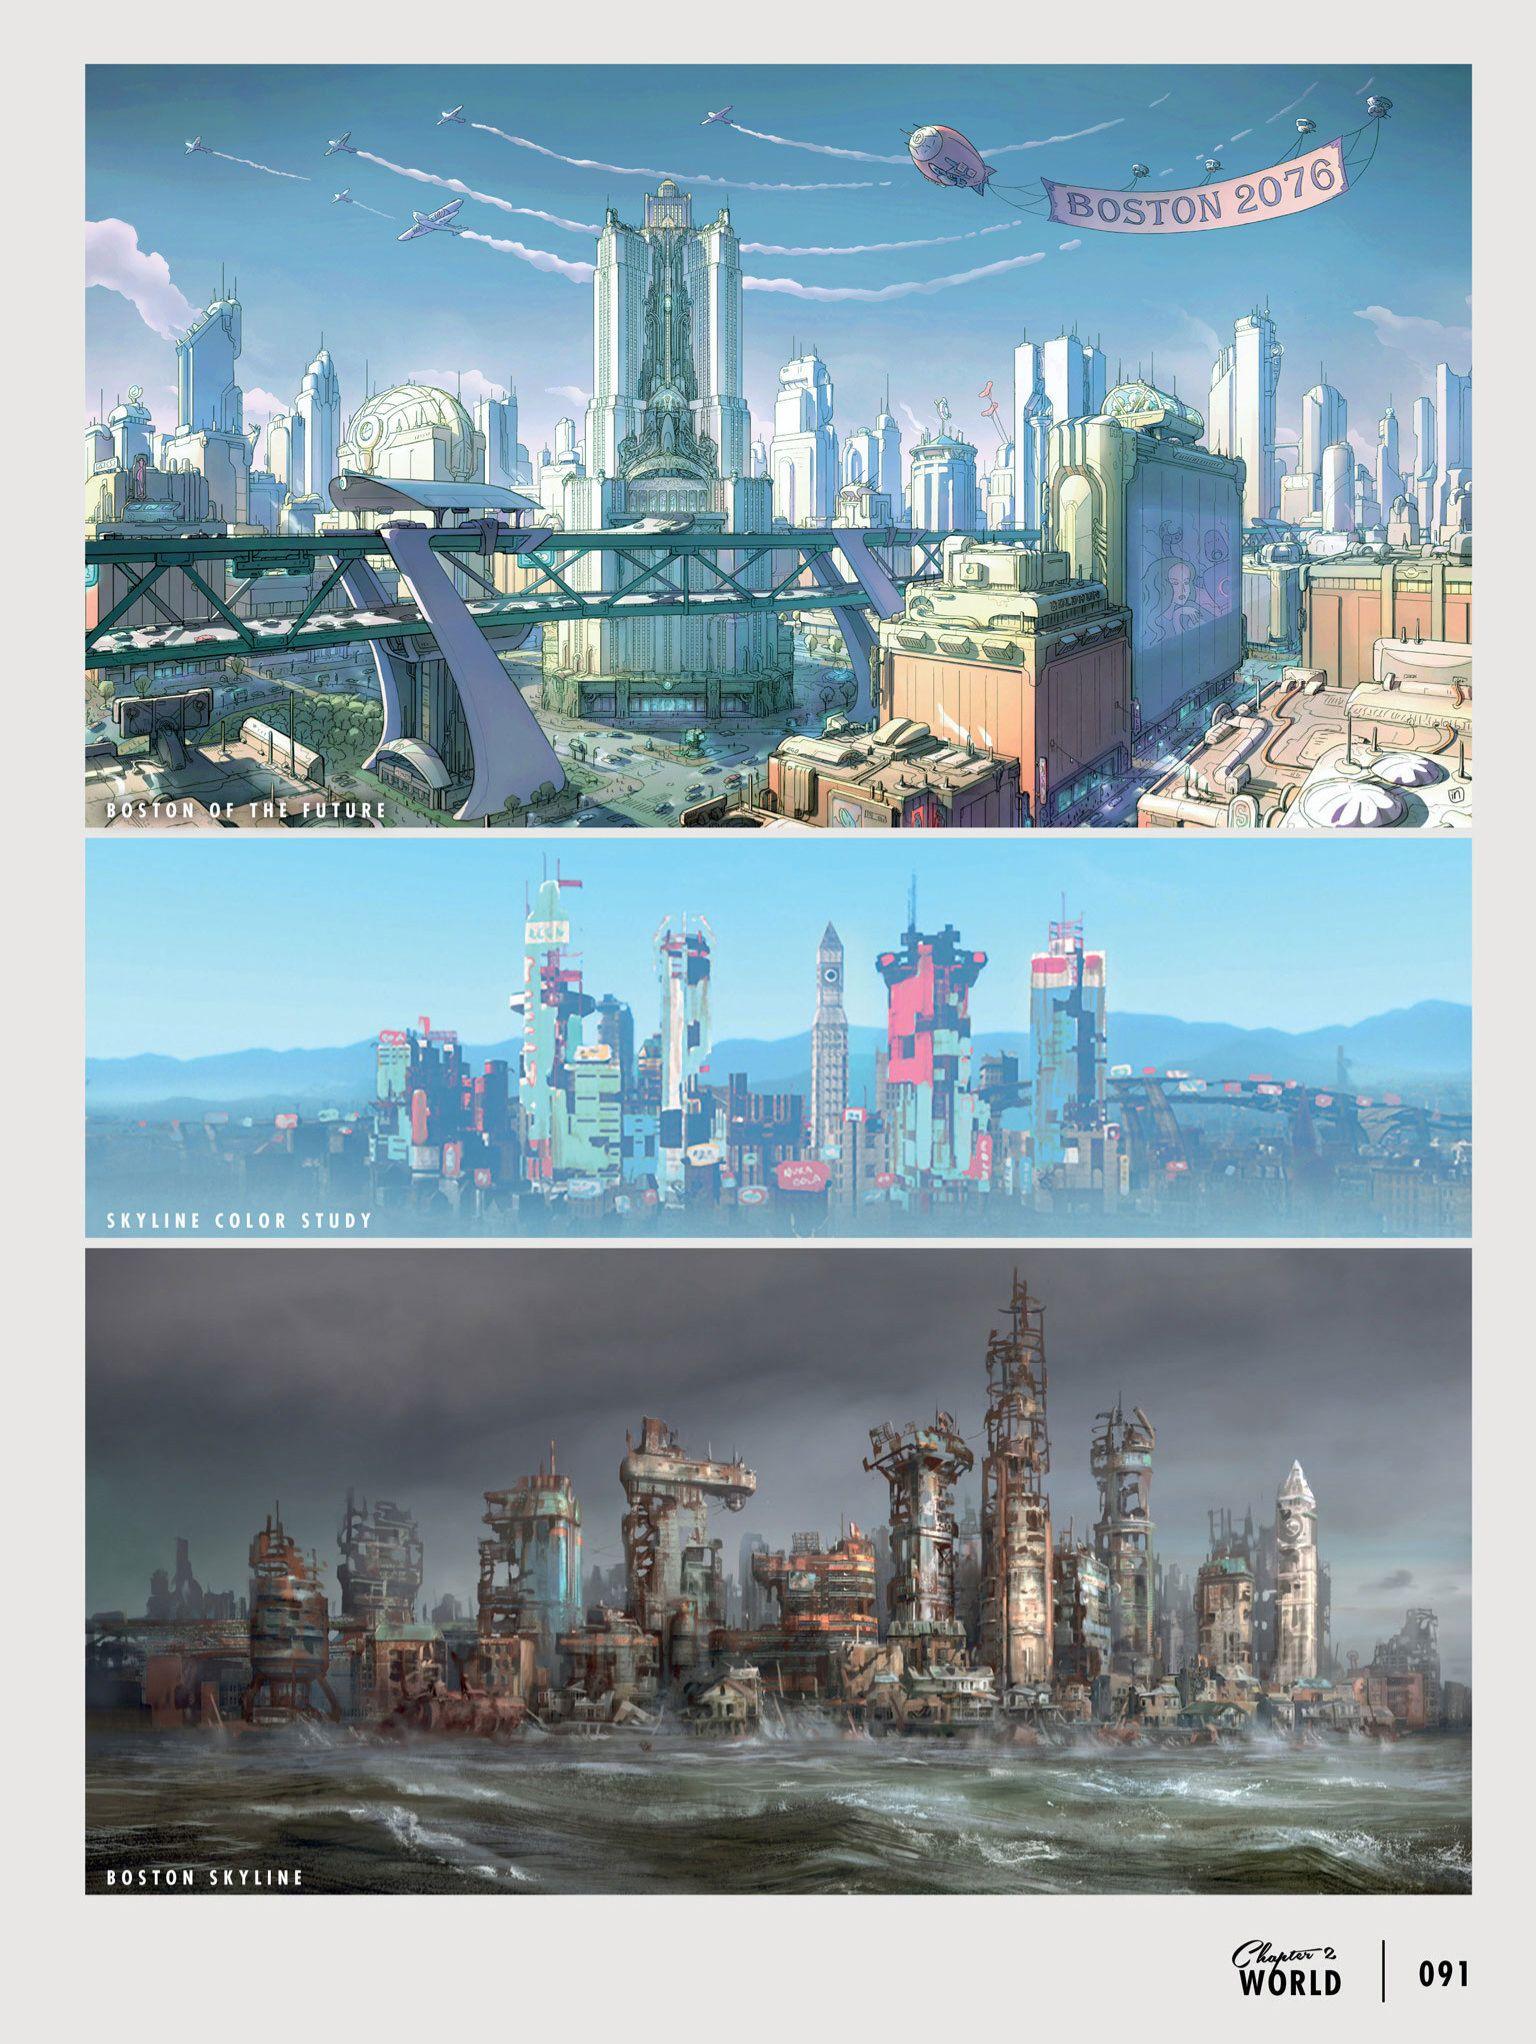 Fallout fallout concept art fallout art - Fallout new vegas skyline ...